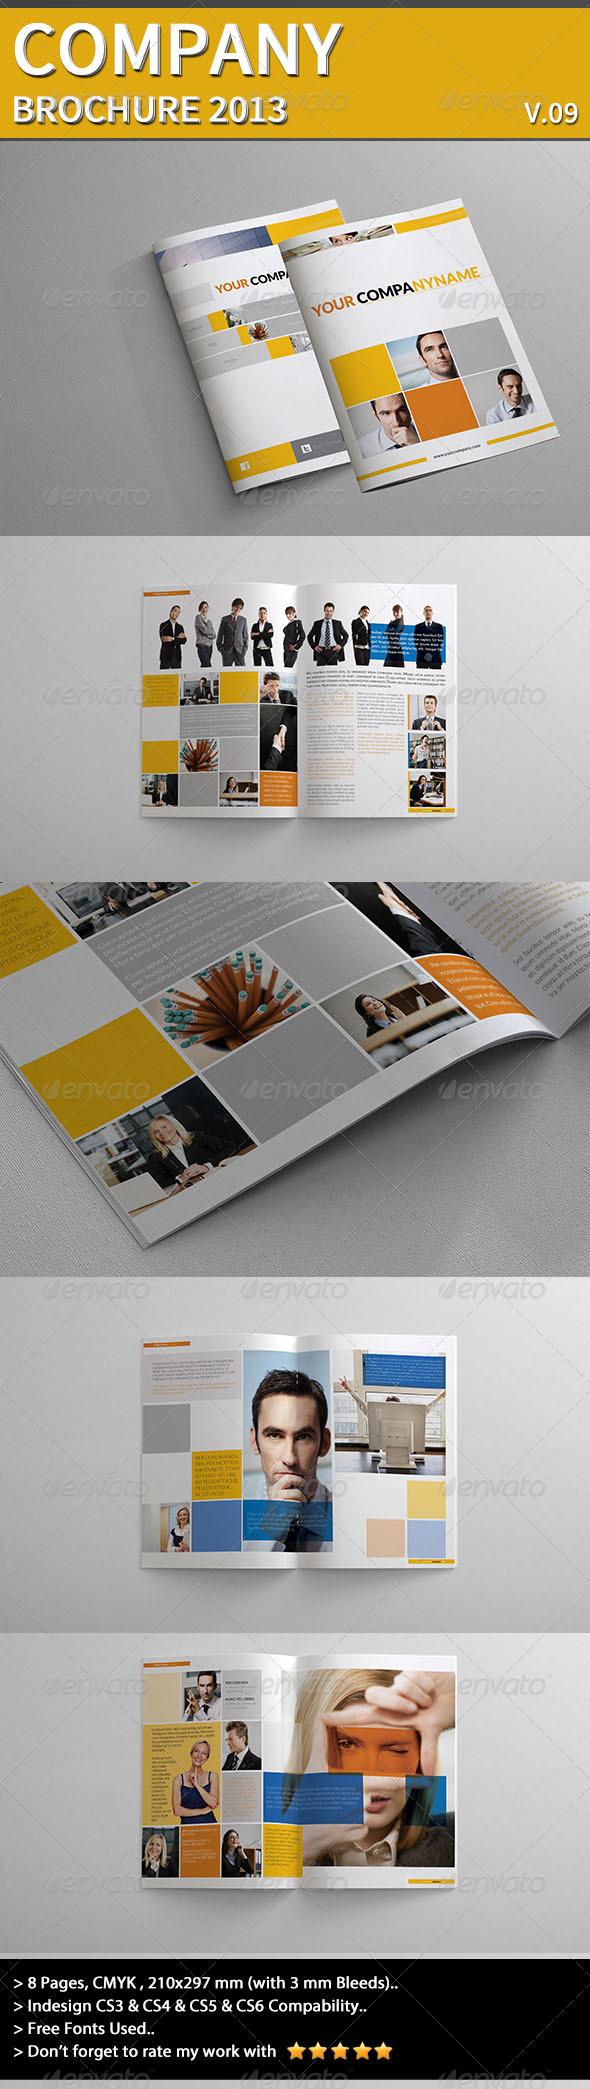 Company Brochure Part 09 - Corporate Brochures